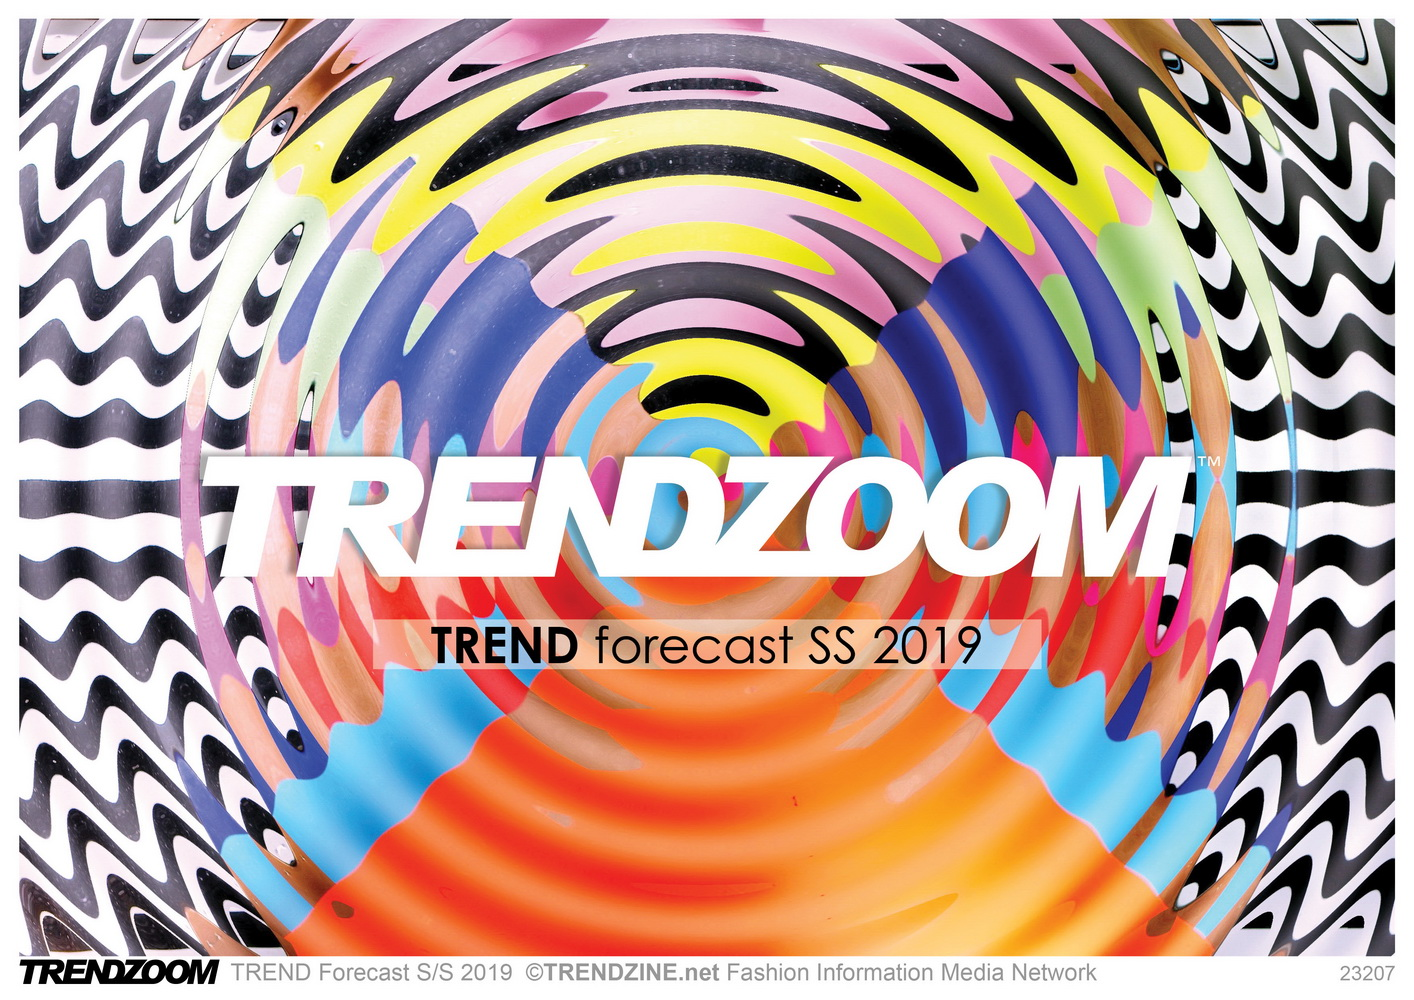 Trendzoom Trend Forecast Ss 2019